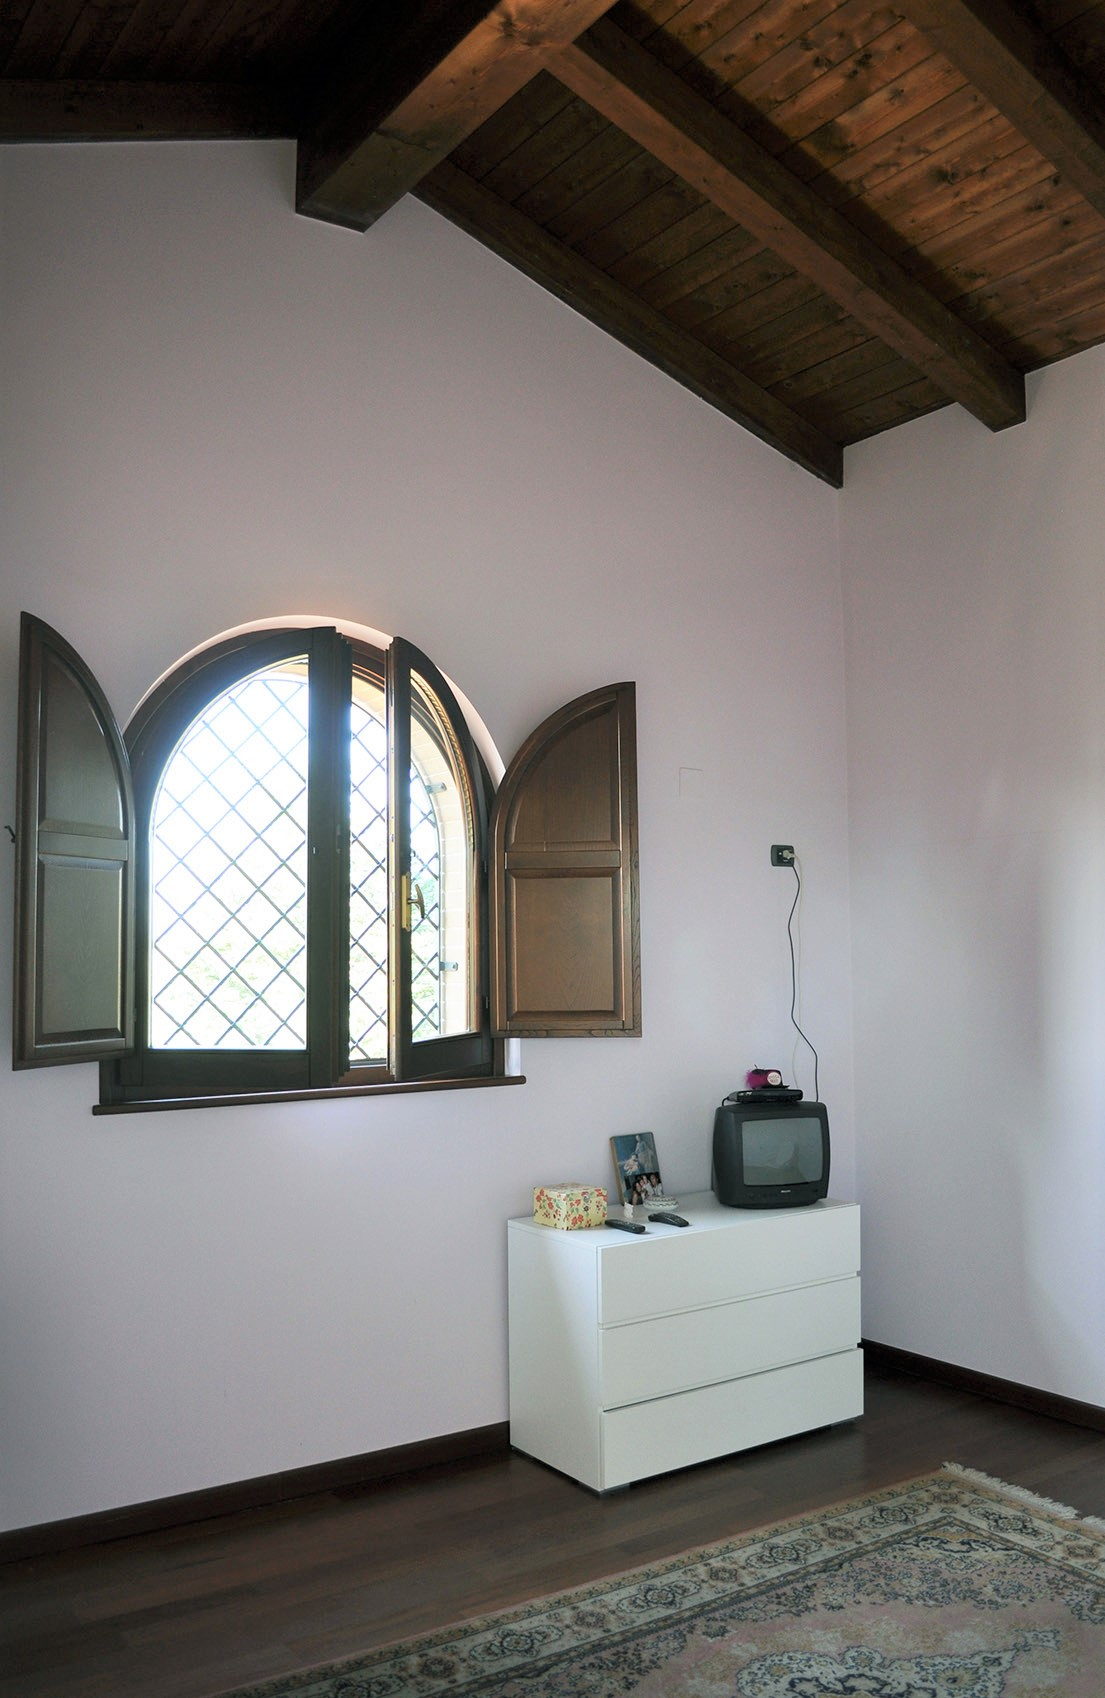 Villa Villa for sale Tortoreto (TE), Villa Bianca - Tortoreto - EUR 770.233 640